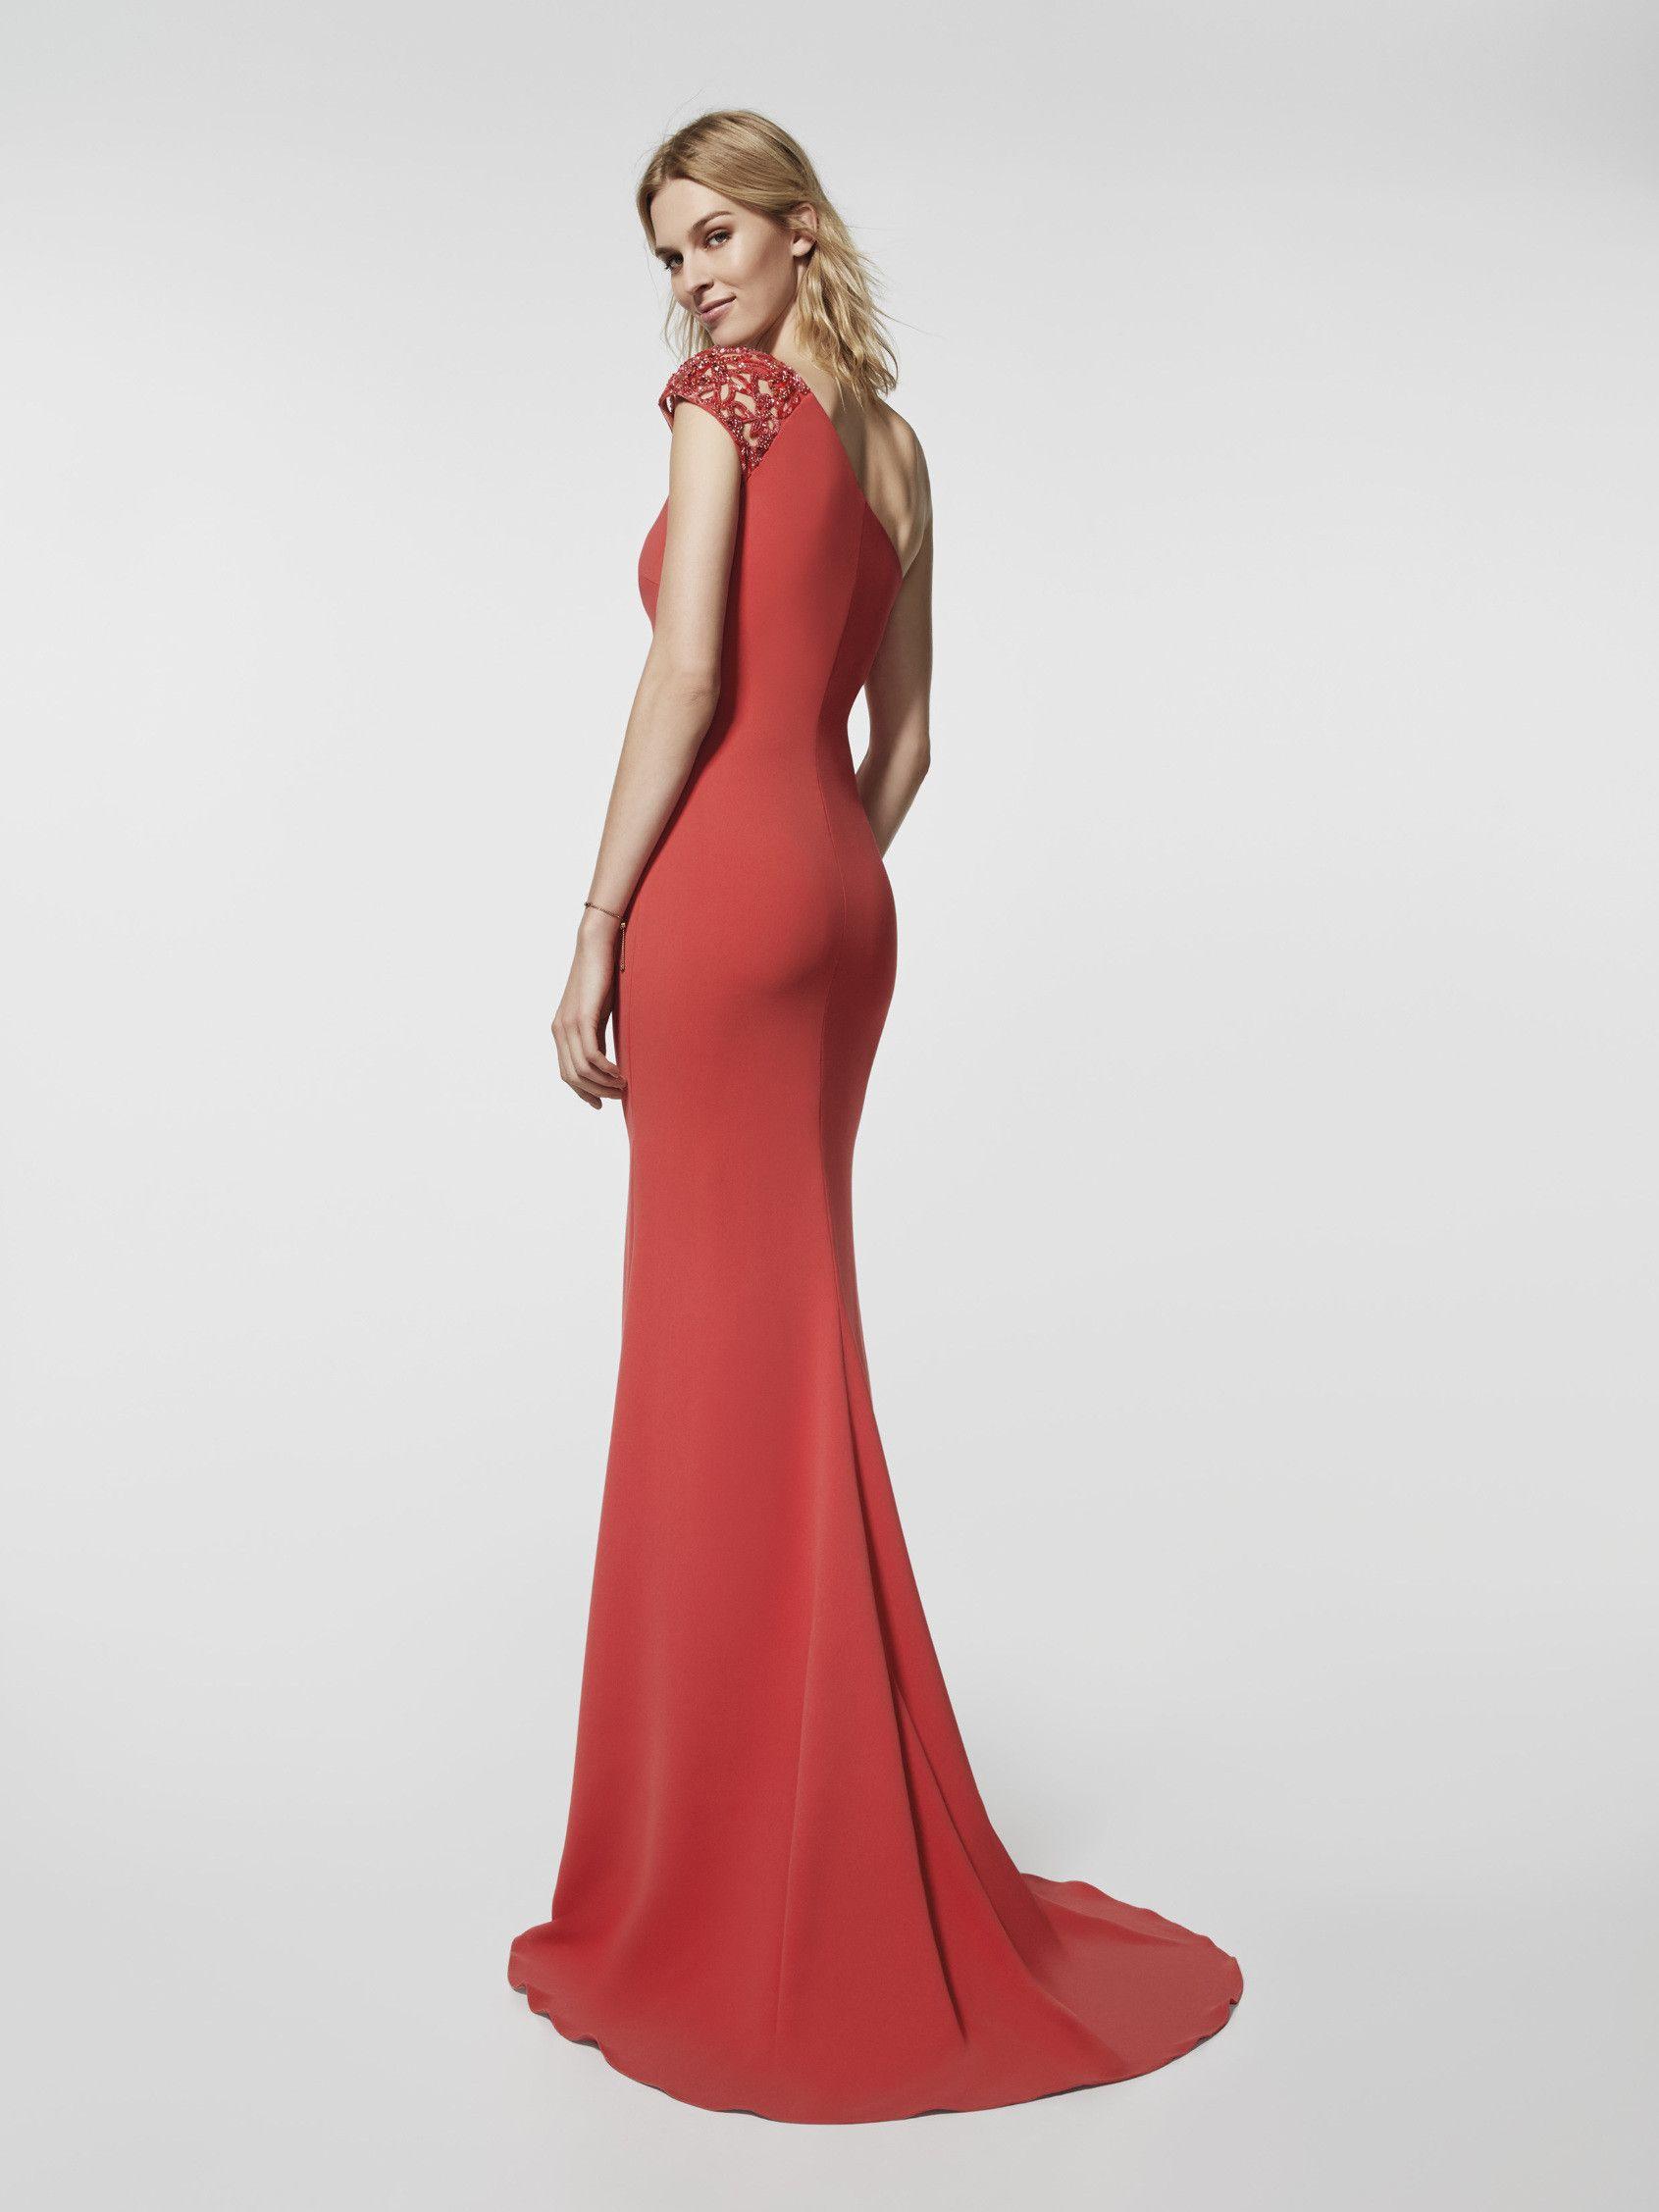 Photo of red cocktail dress grado long sleeveless dress